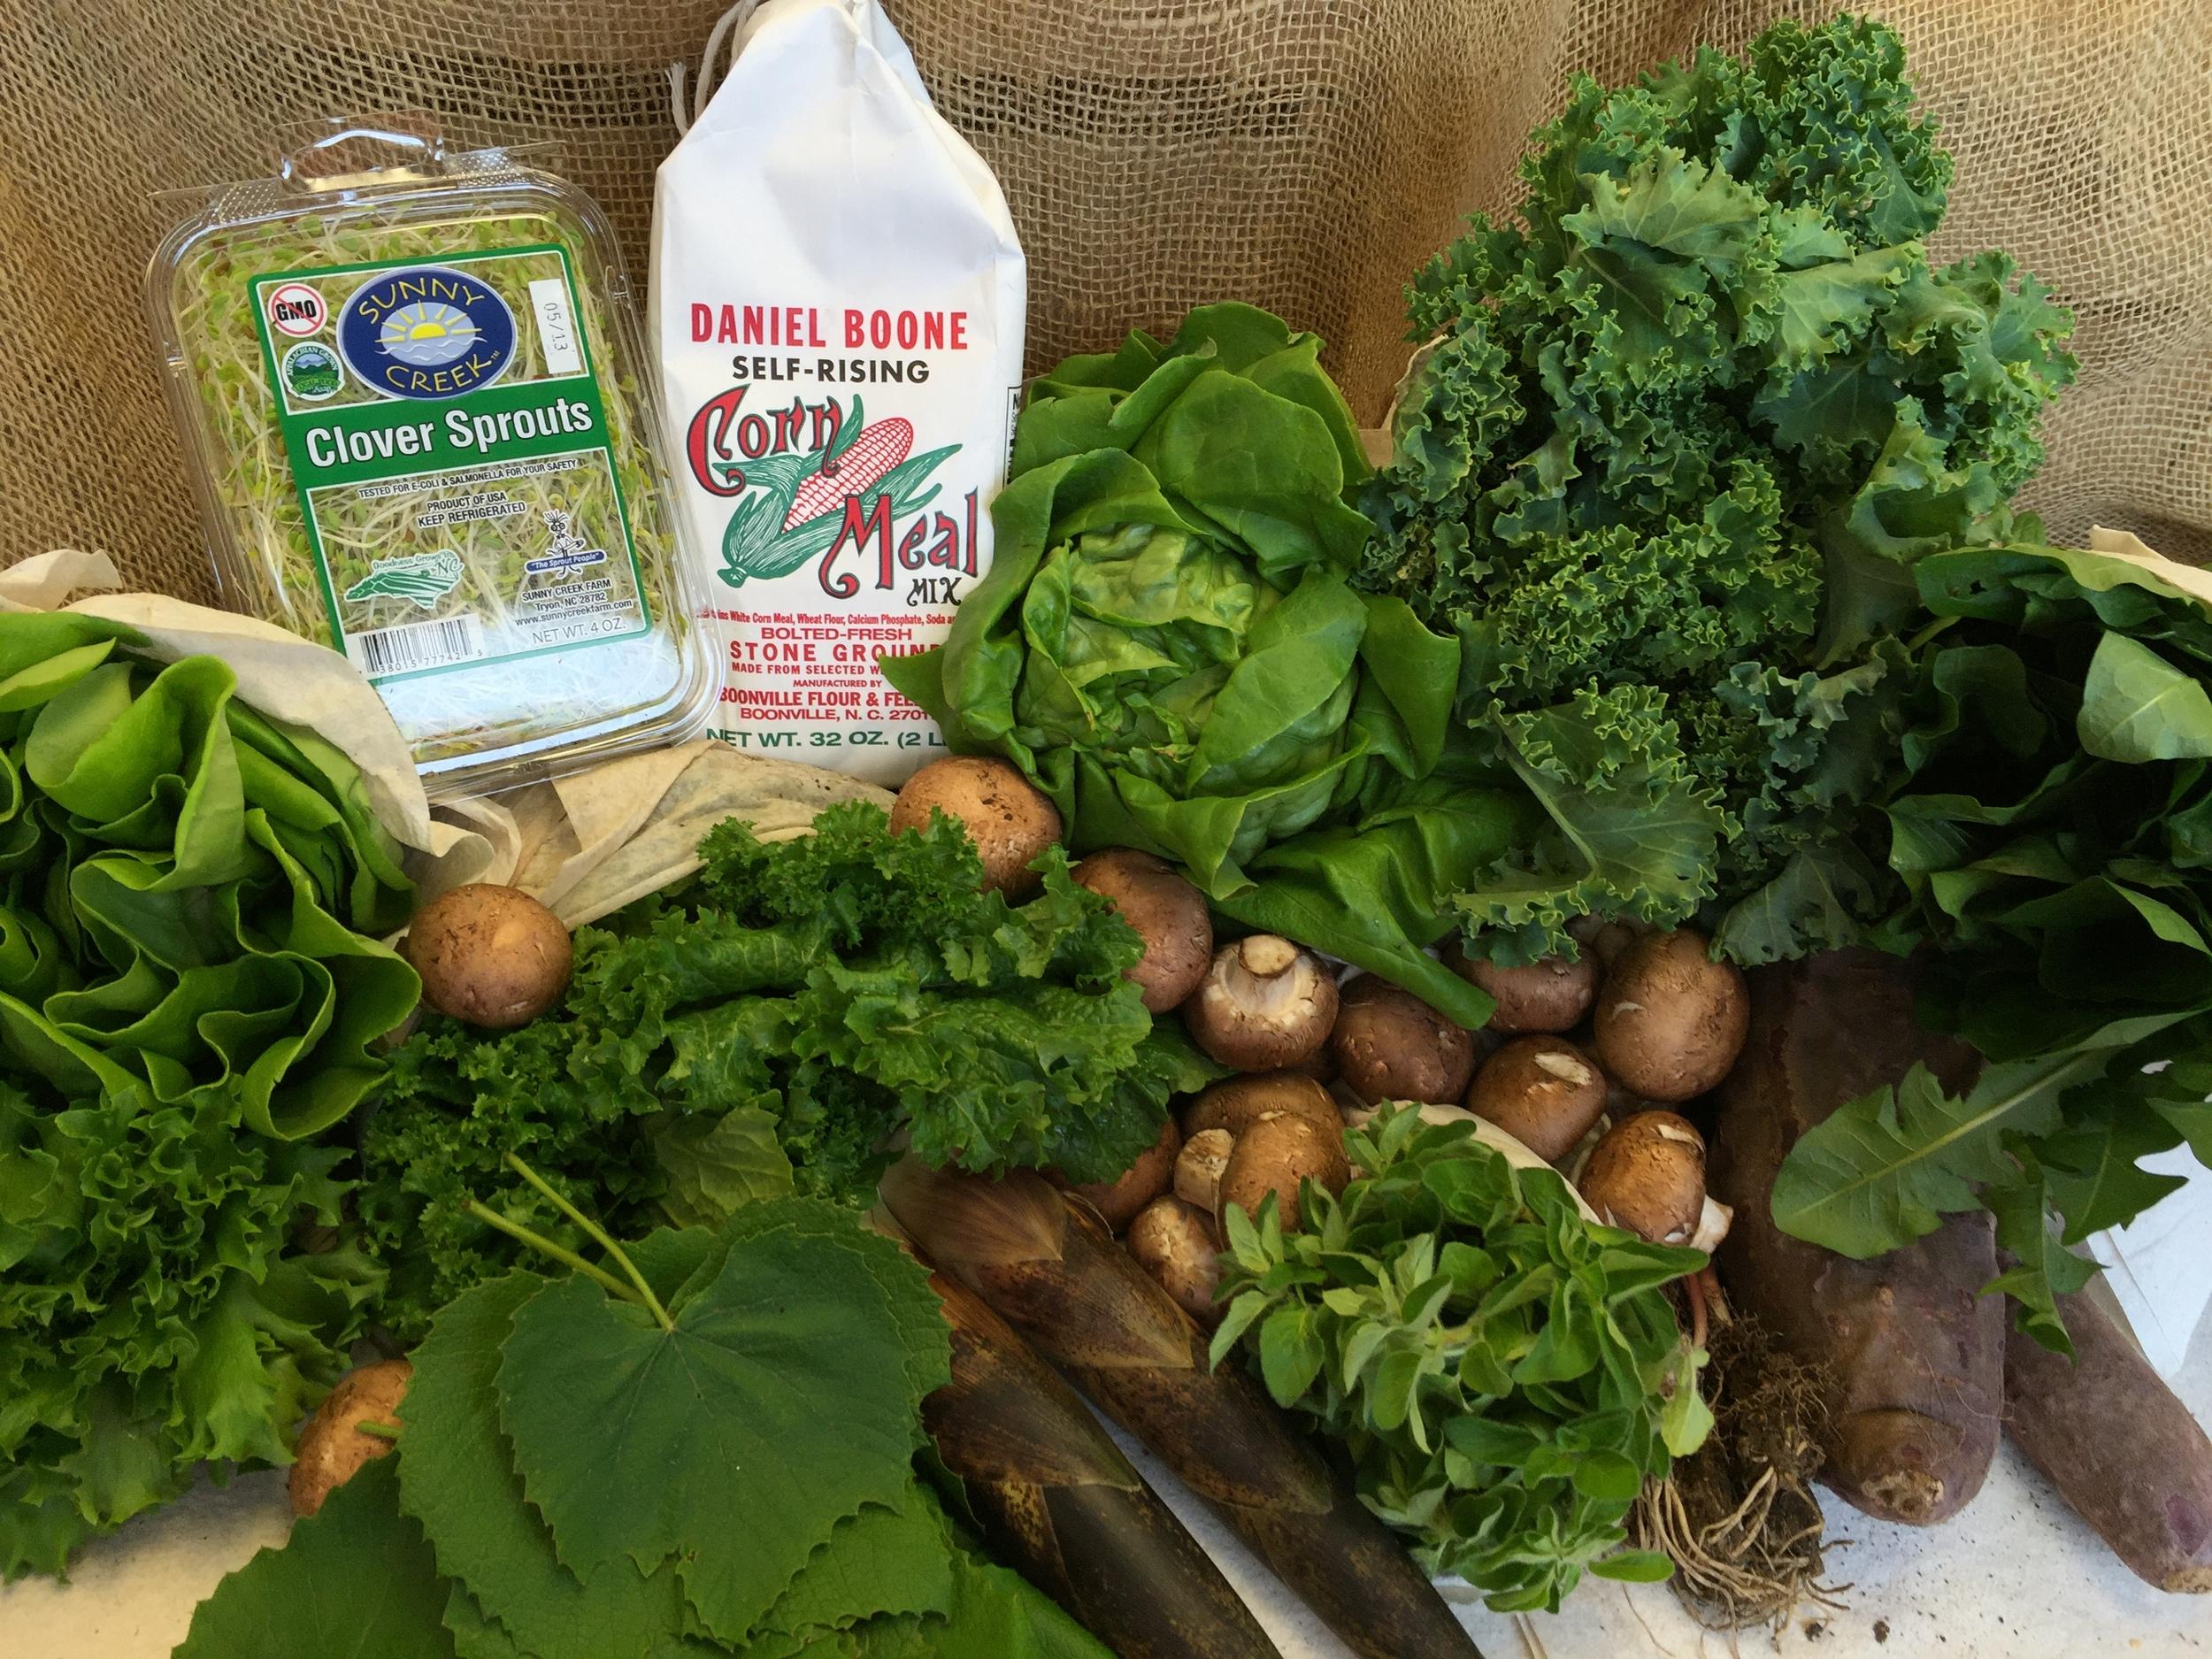 Hydroponic Lettuce, Ramps, Mixed Herbs, Cherry Radish, Spring Mix, Bamboo Shoots, Shitake Mushrooms, Grape Leaves, Arugula, Siberian Curly Kale, Purple Sweet Potatoes.